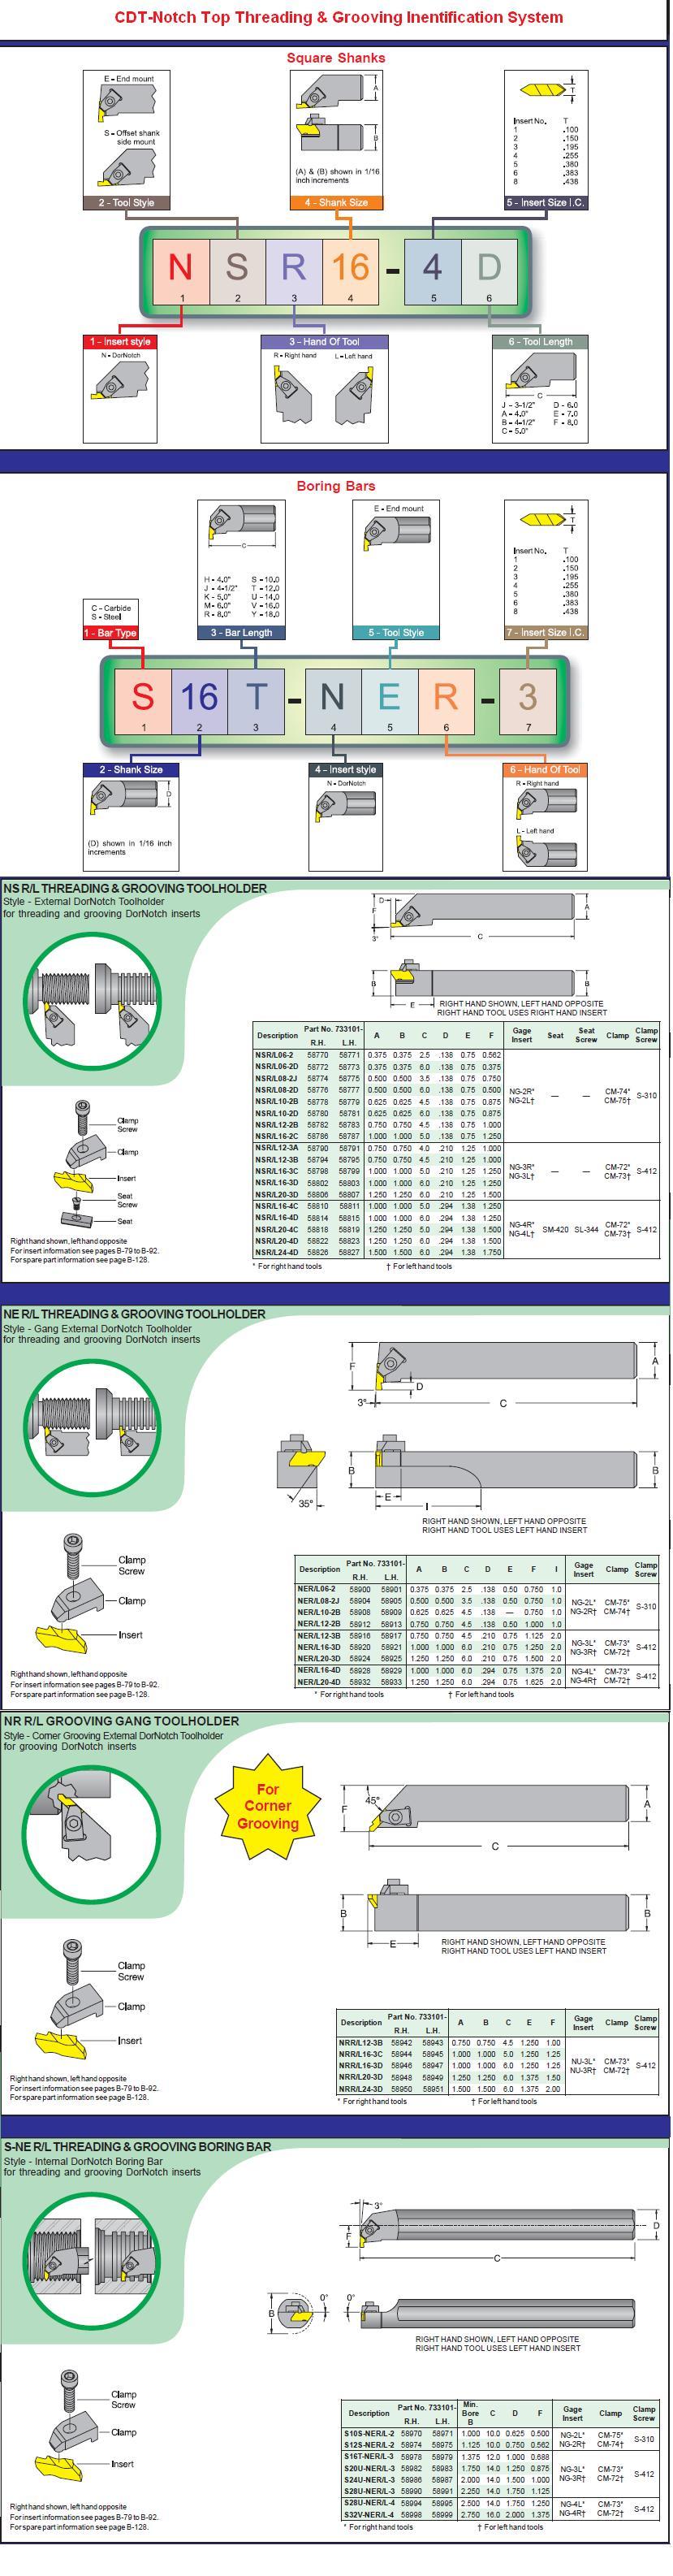 Threading Tool Holder,S10S-NEL-2,LH